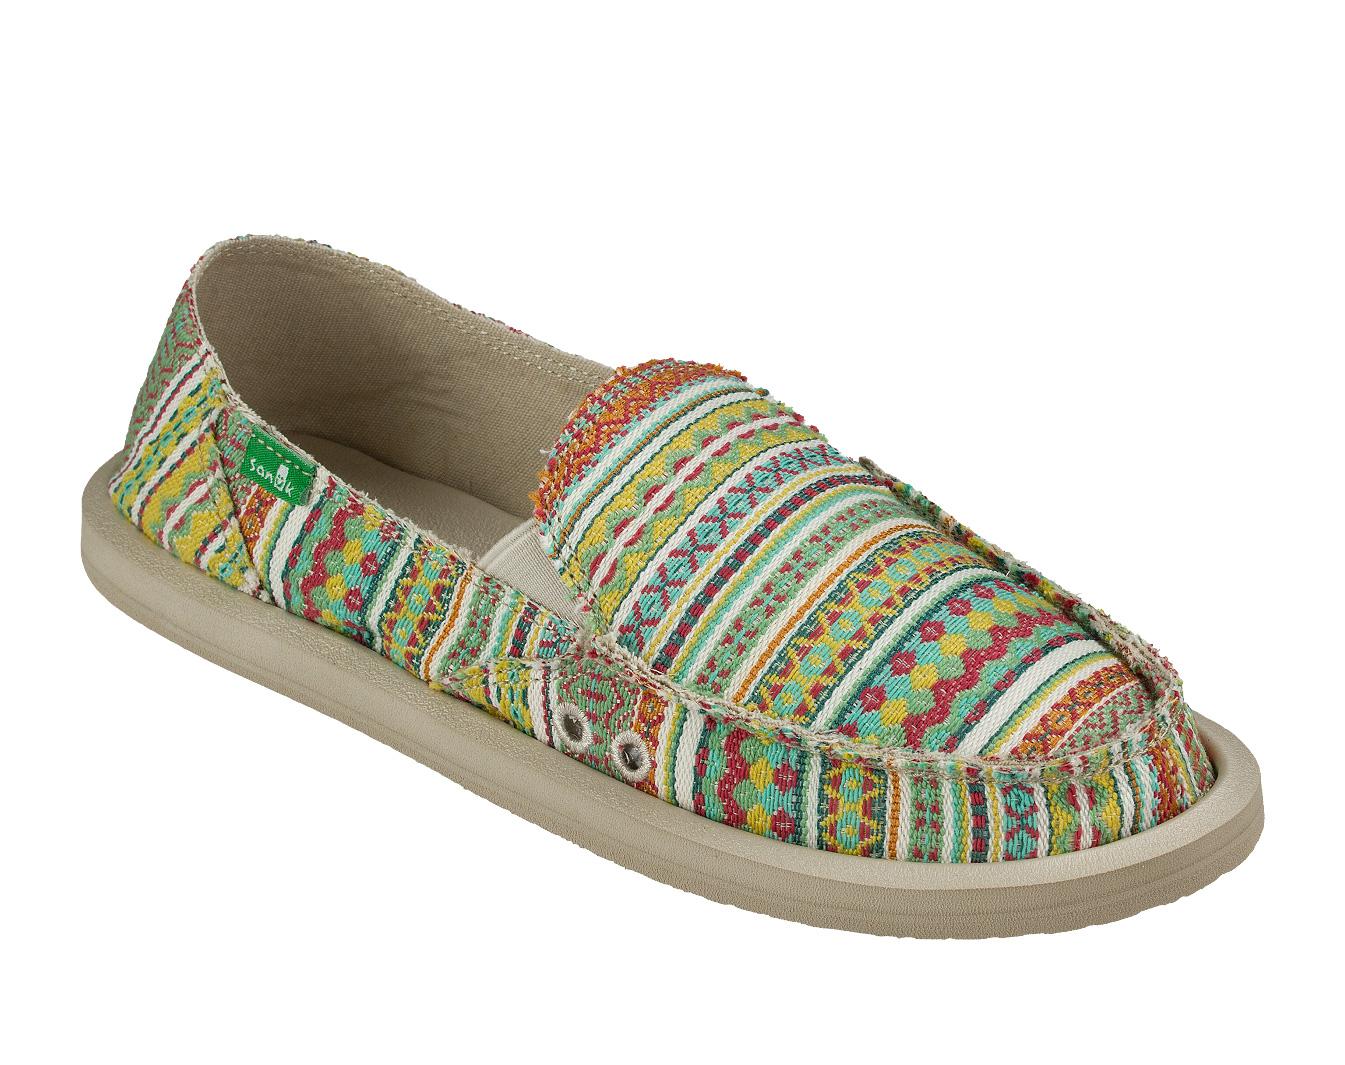 Sanuk Damenschuhe Sandale - Damenschuhe Blanket -  Beach Summer Slippers Sidewalk Surfer